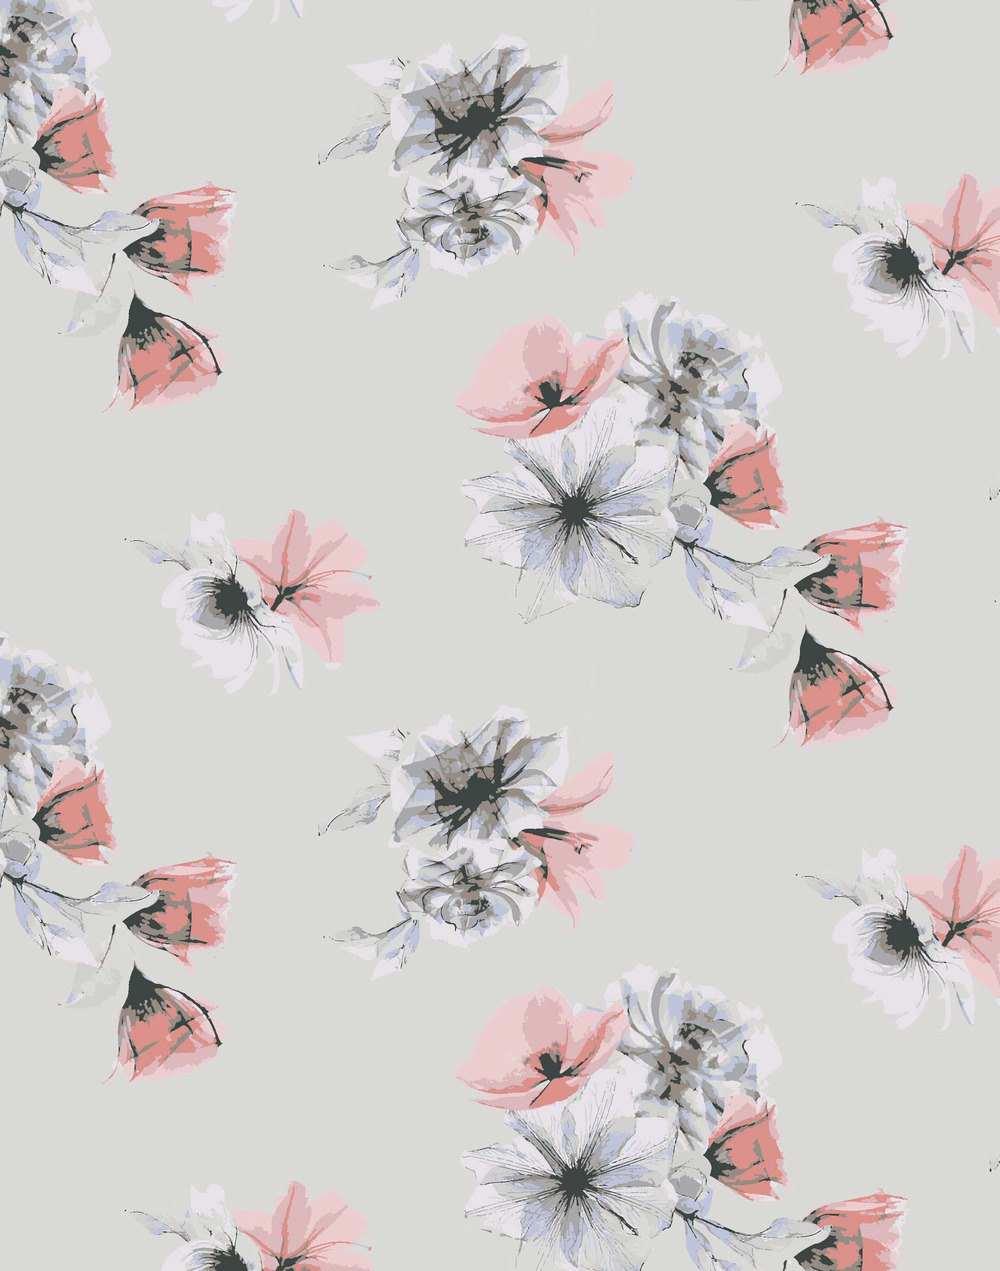 xray floral.jpg